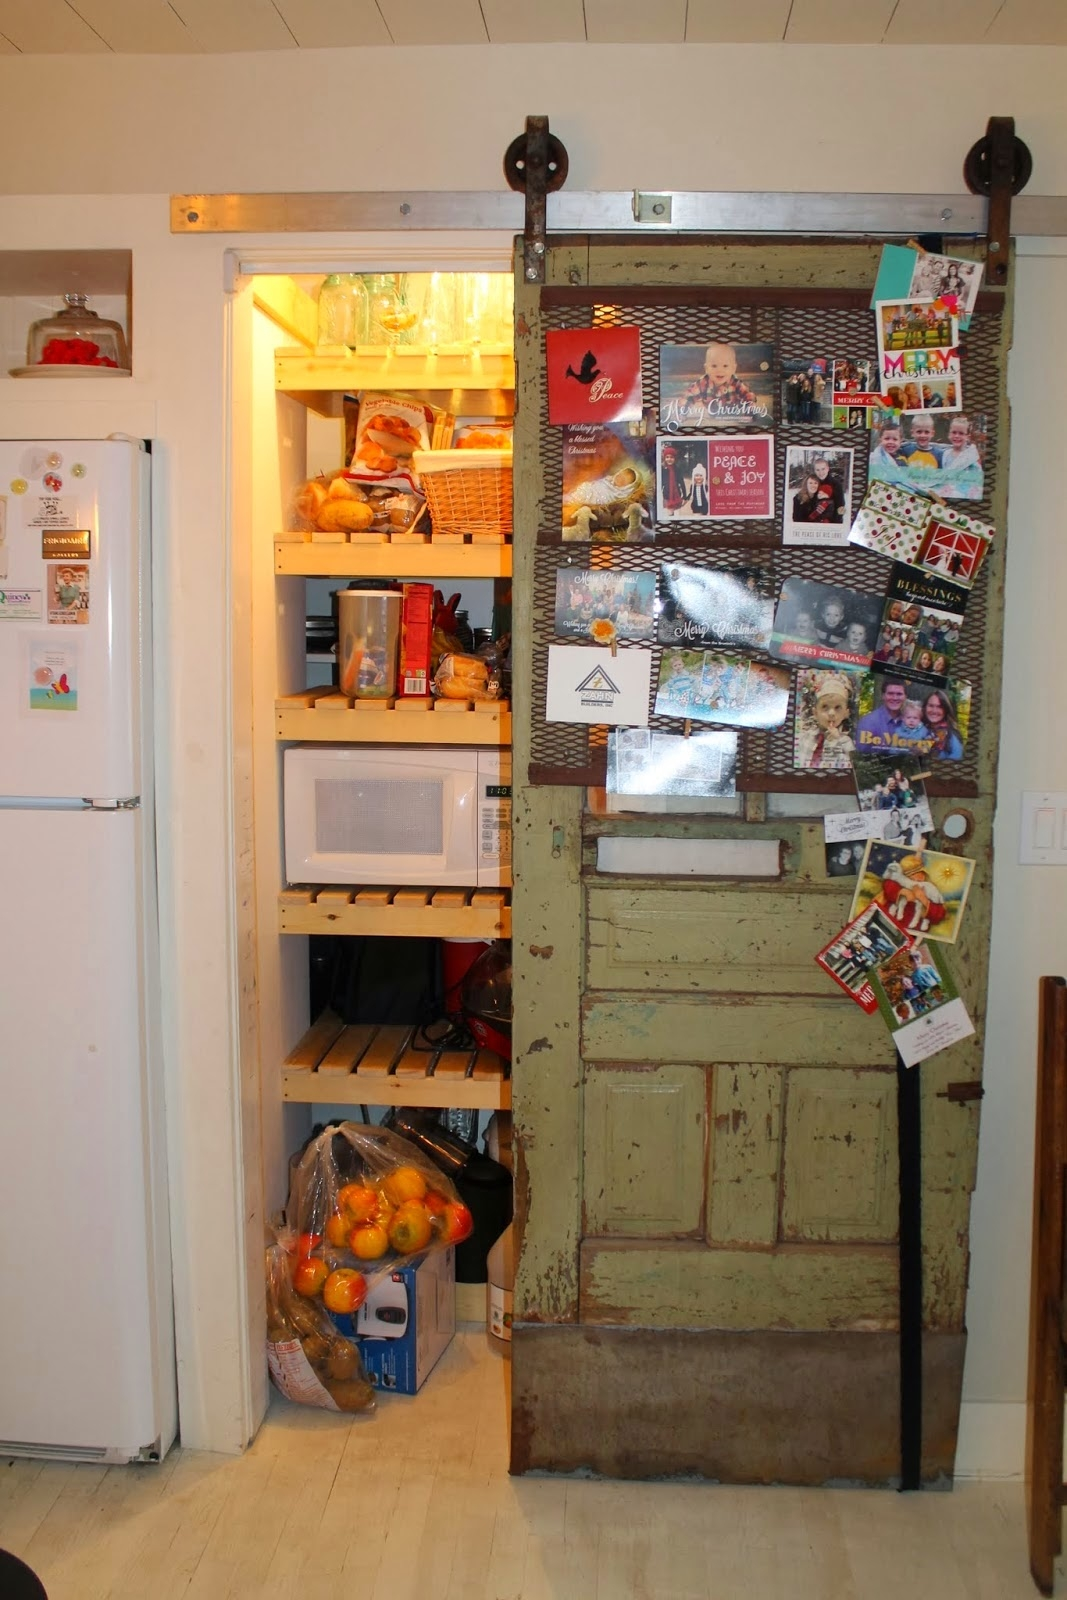 Sliding Barn Door Kitchen Pantryremodelaholic sliding barn door pantry makeover with wood slat